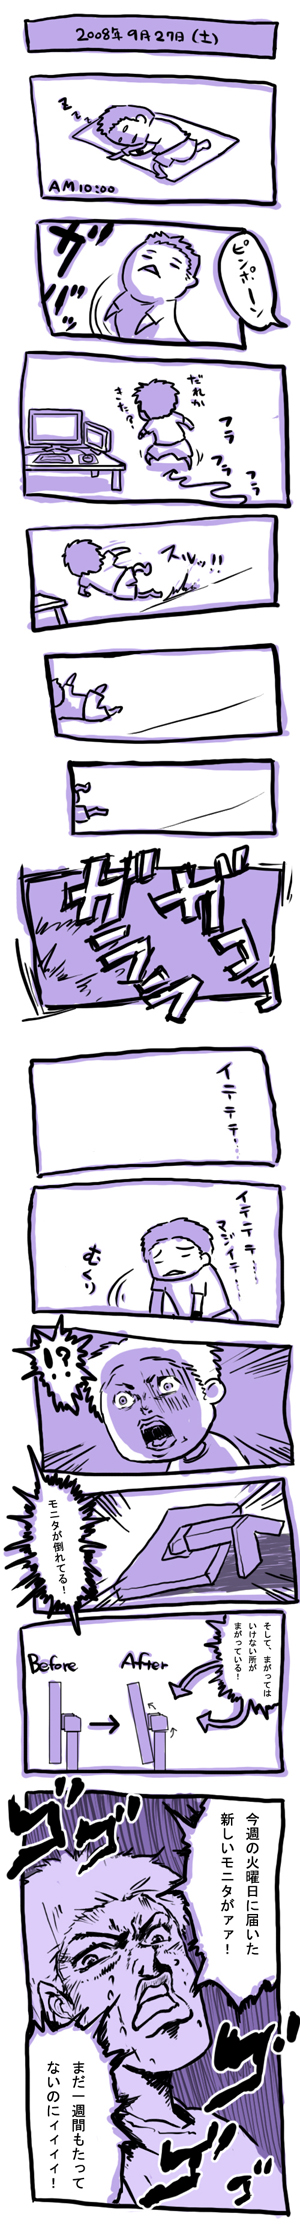 asuka02.jpg